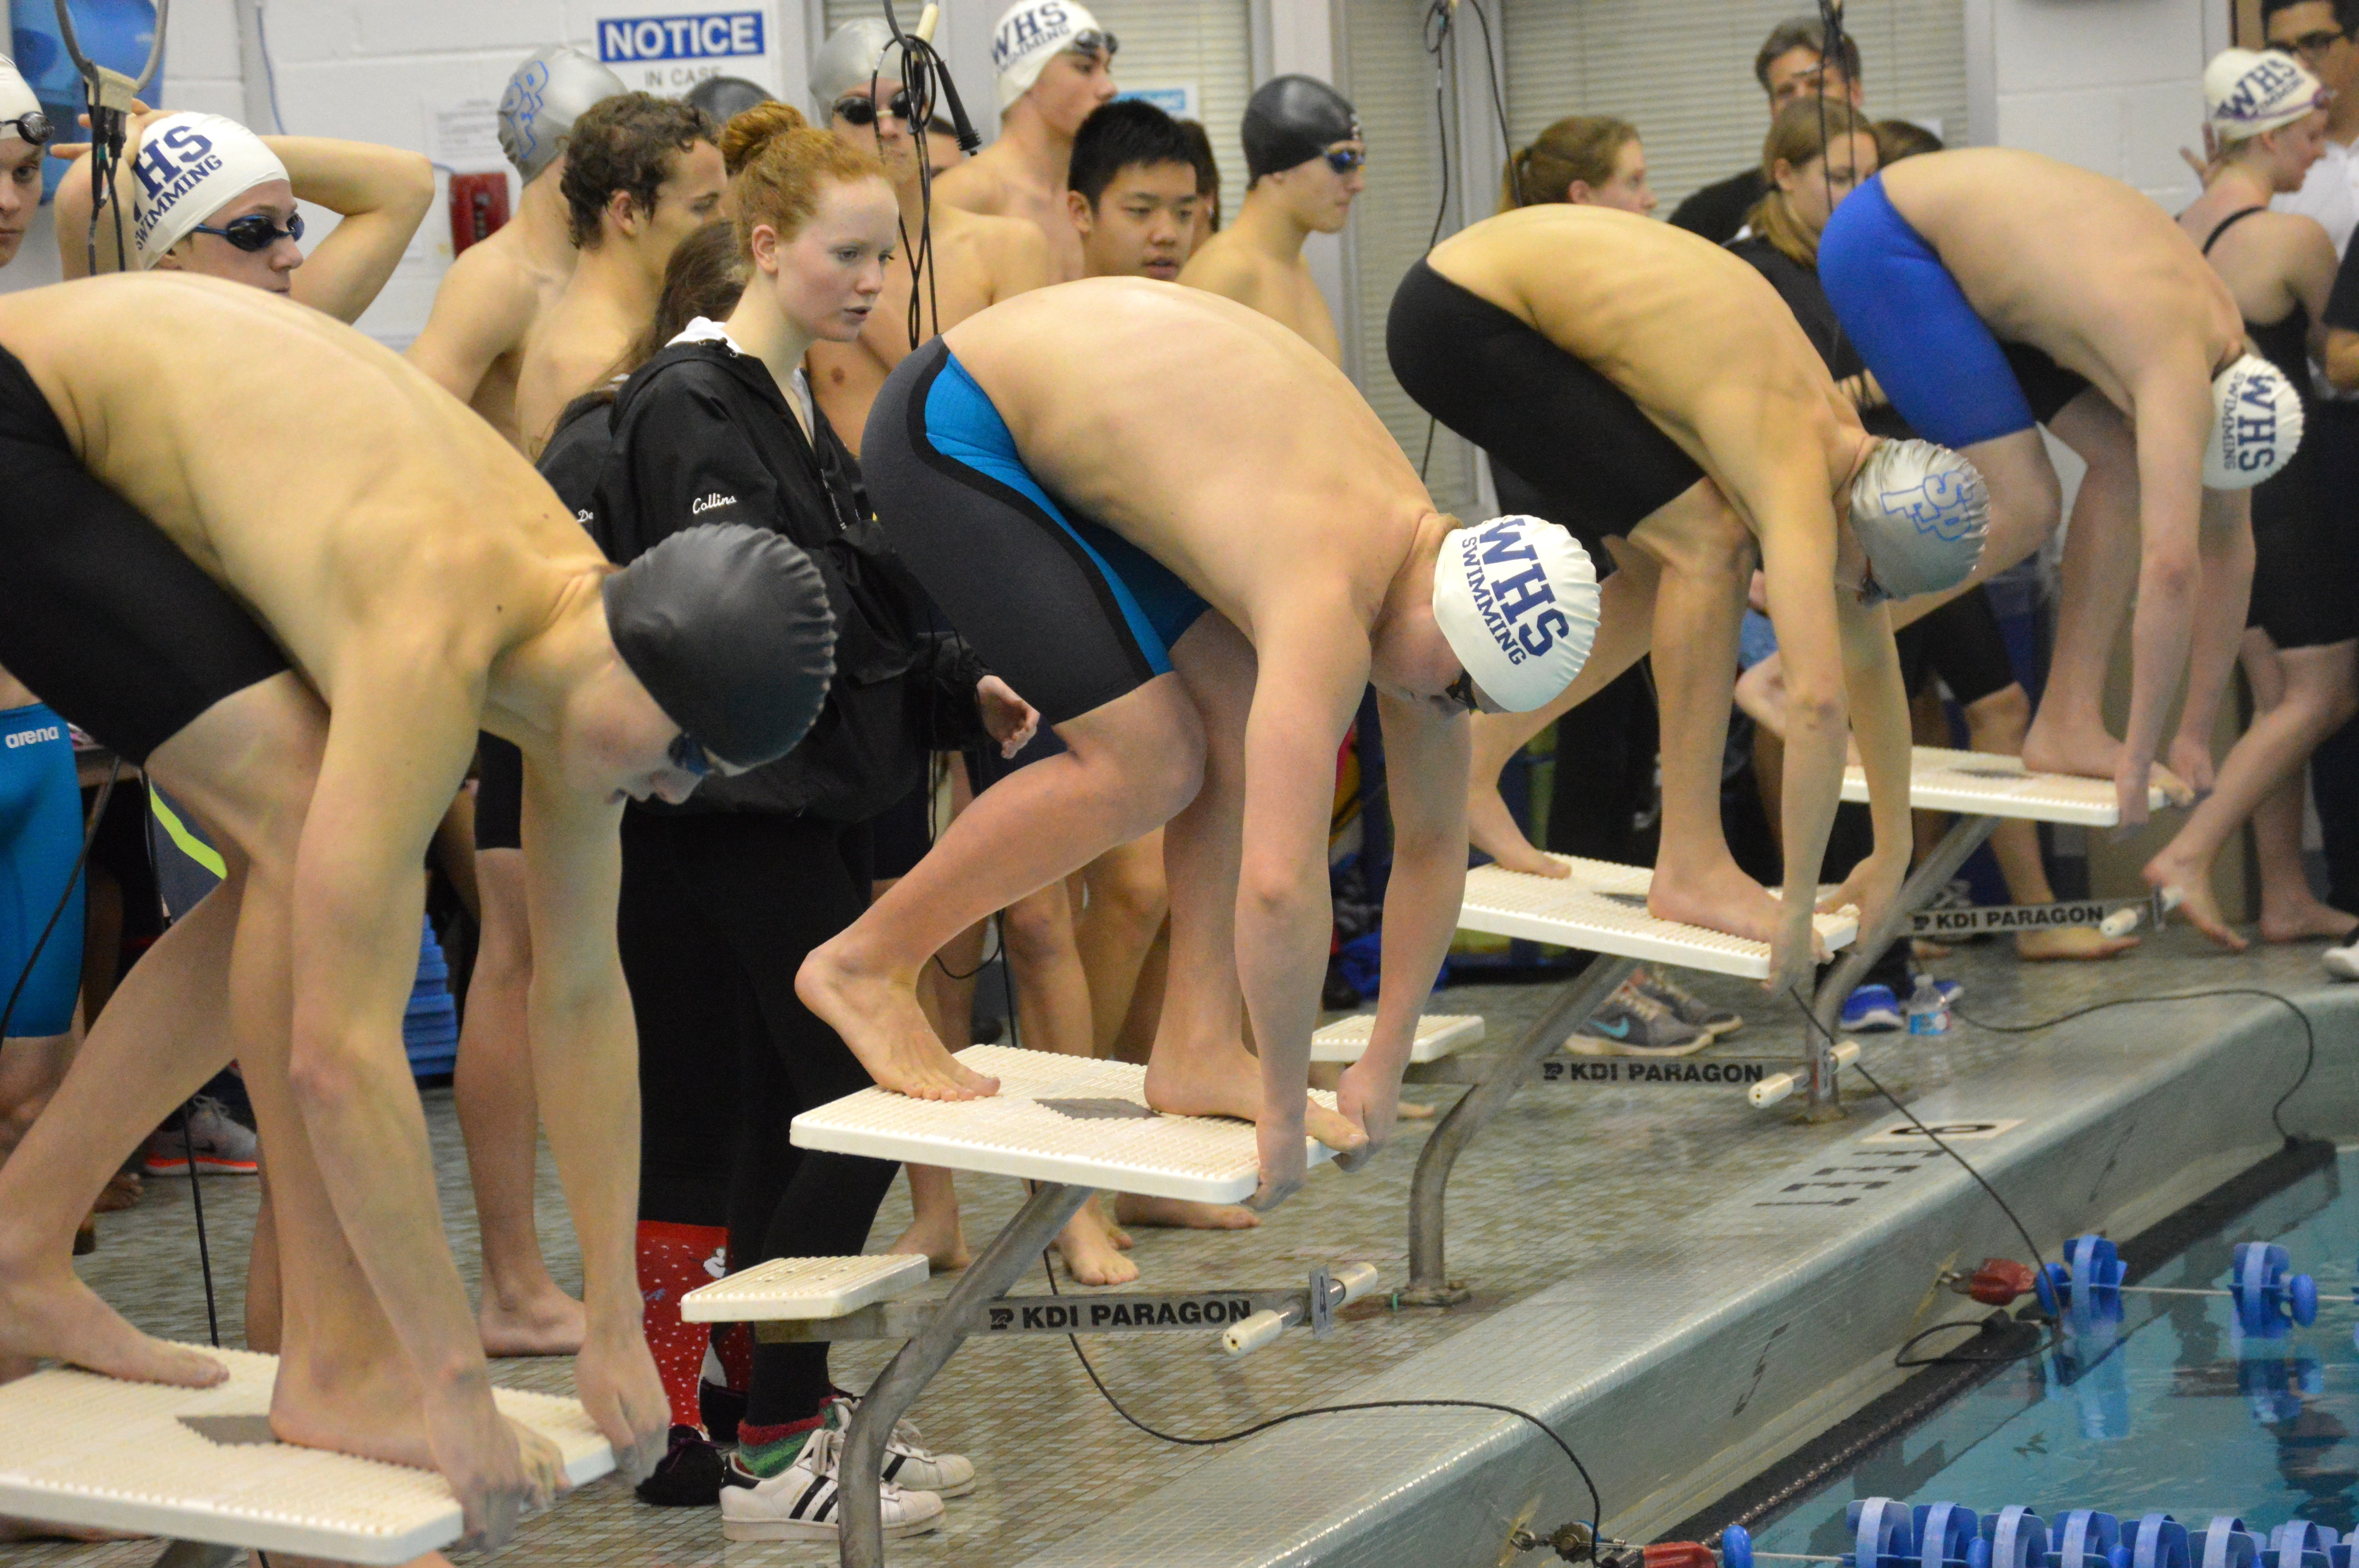 08d9f37cb14a1f85d2e7_WF-SPF_-_Swimmer_await_the_gun_for_freestyle_4x100_relay.JPG